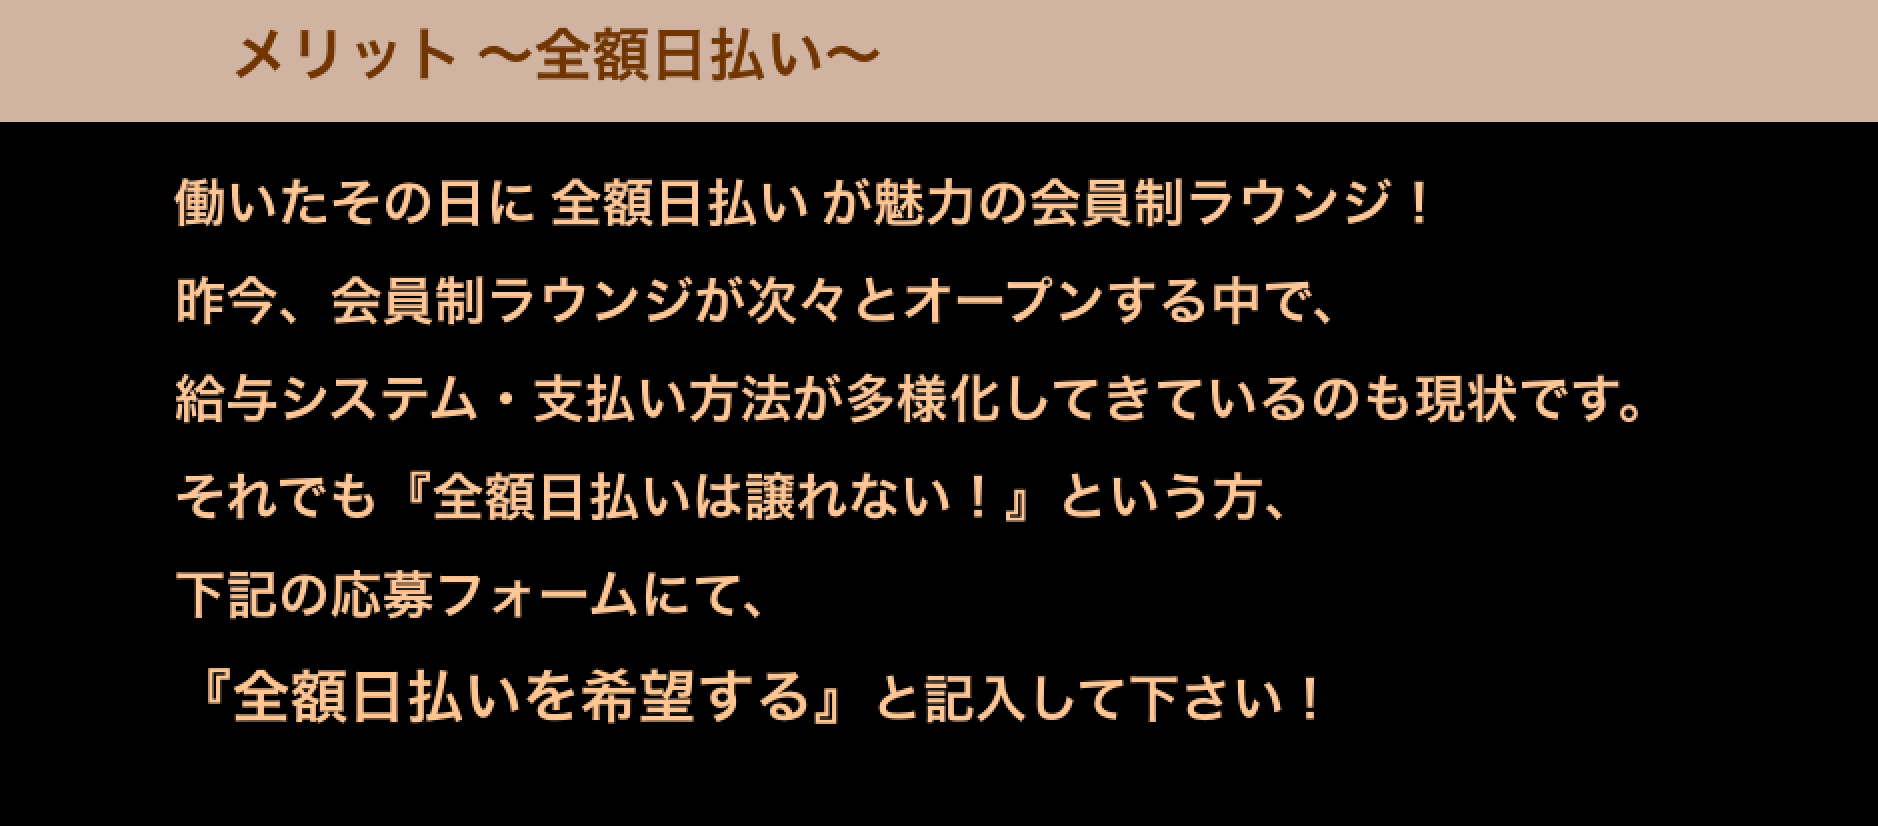 zengaku_hibarai_3